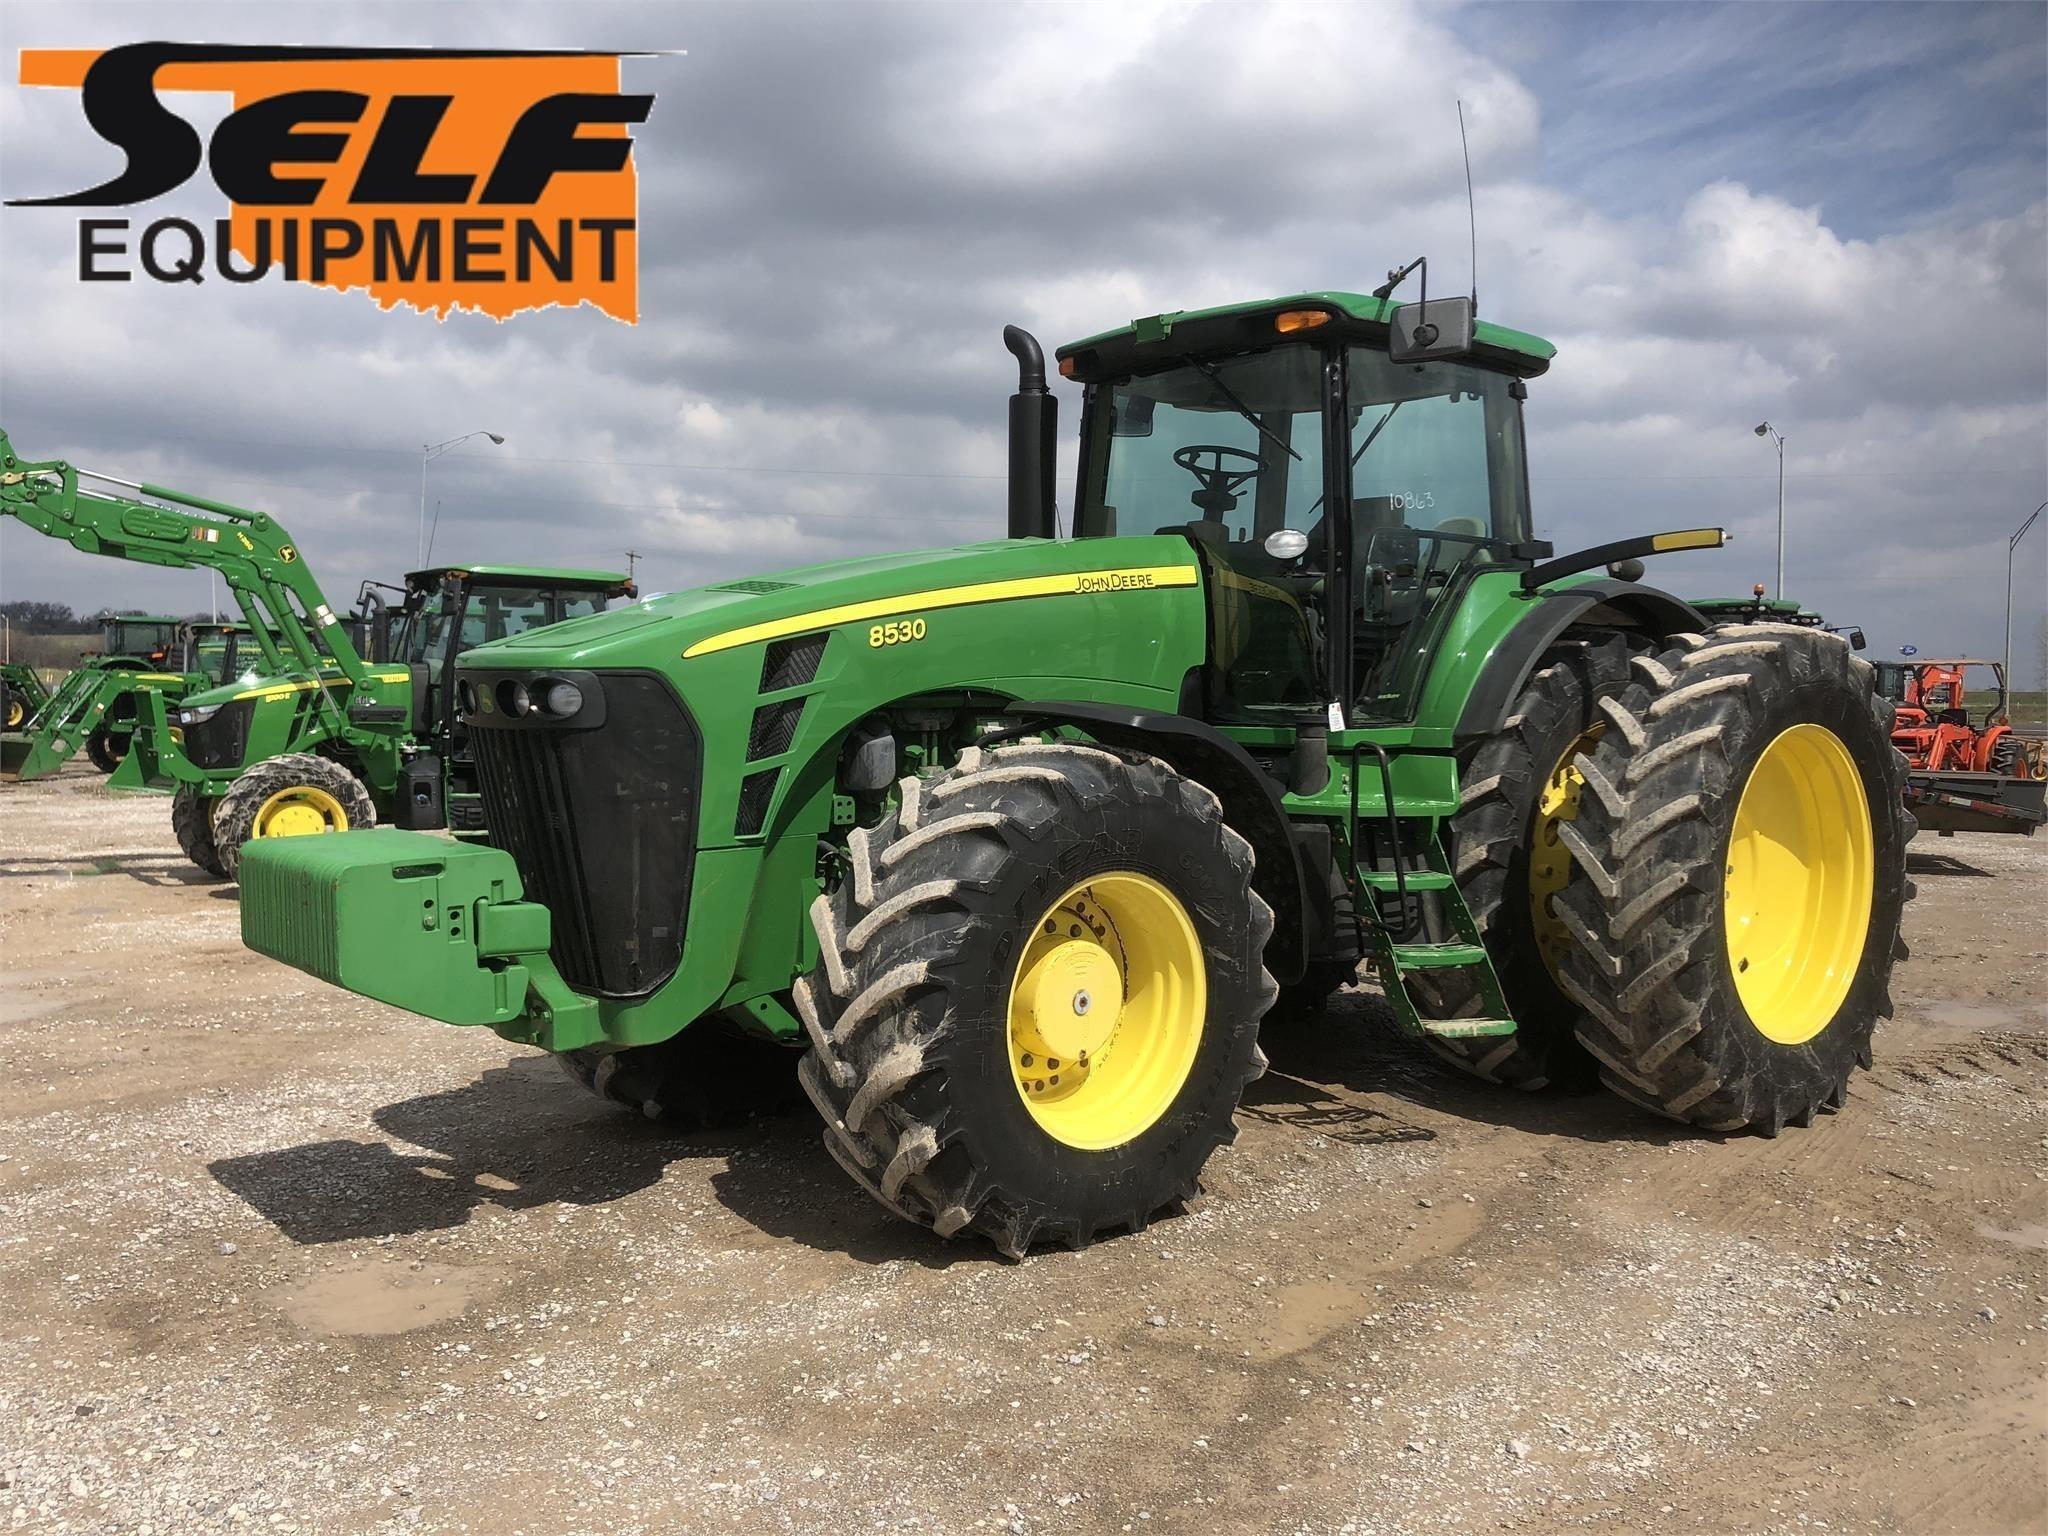 John Deere 8530 Tractor Pauls Valley Oklahoma Machinery Pete